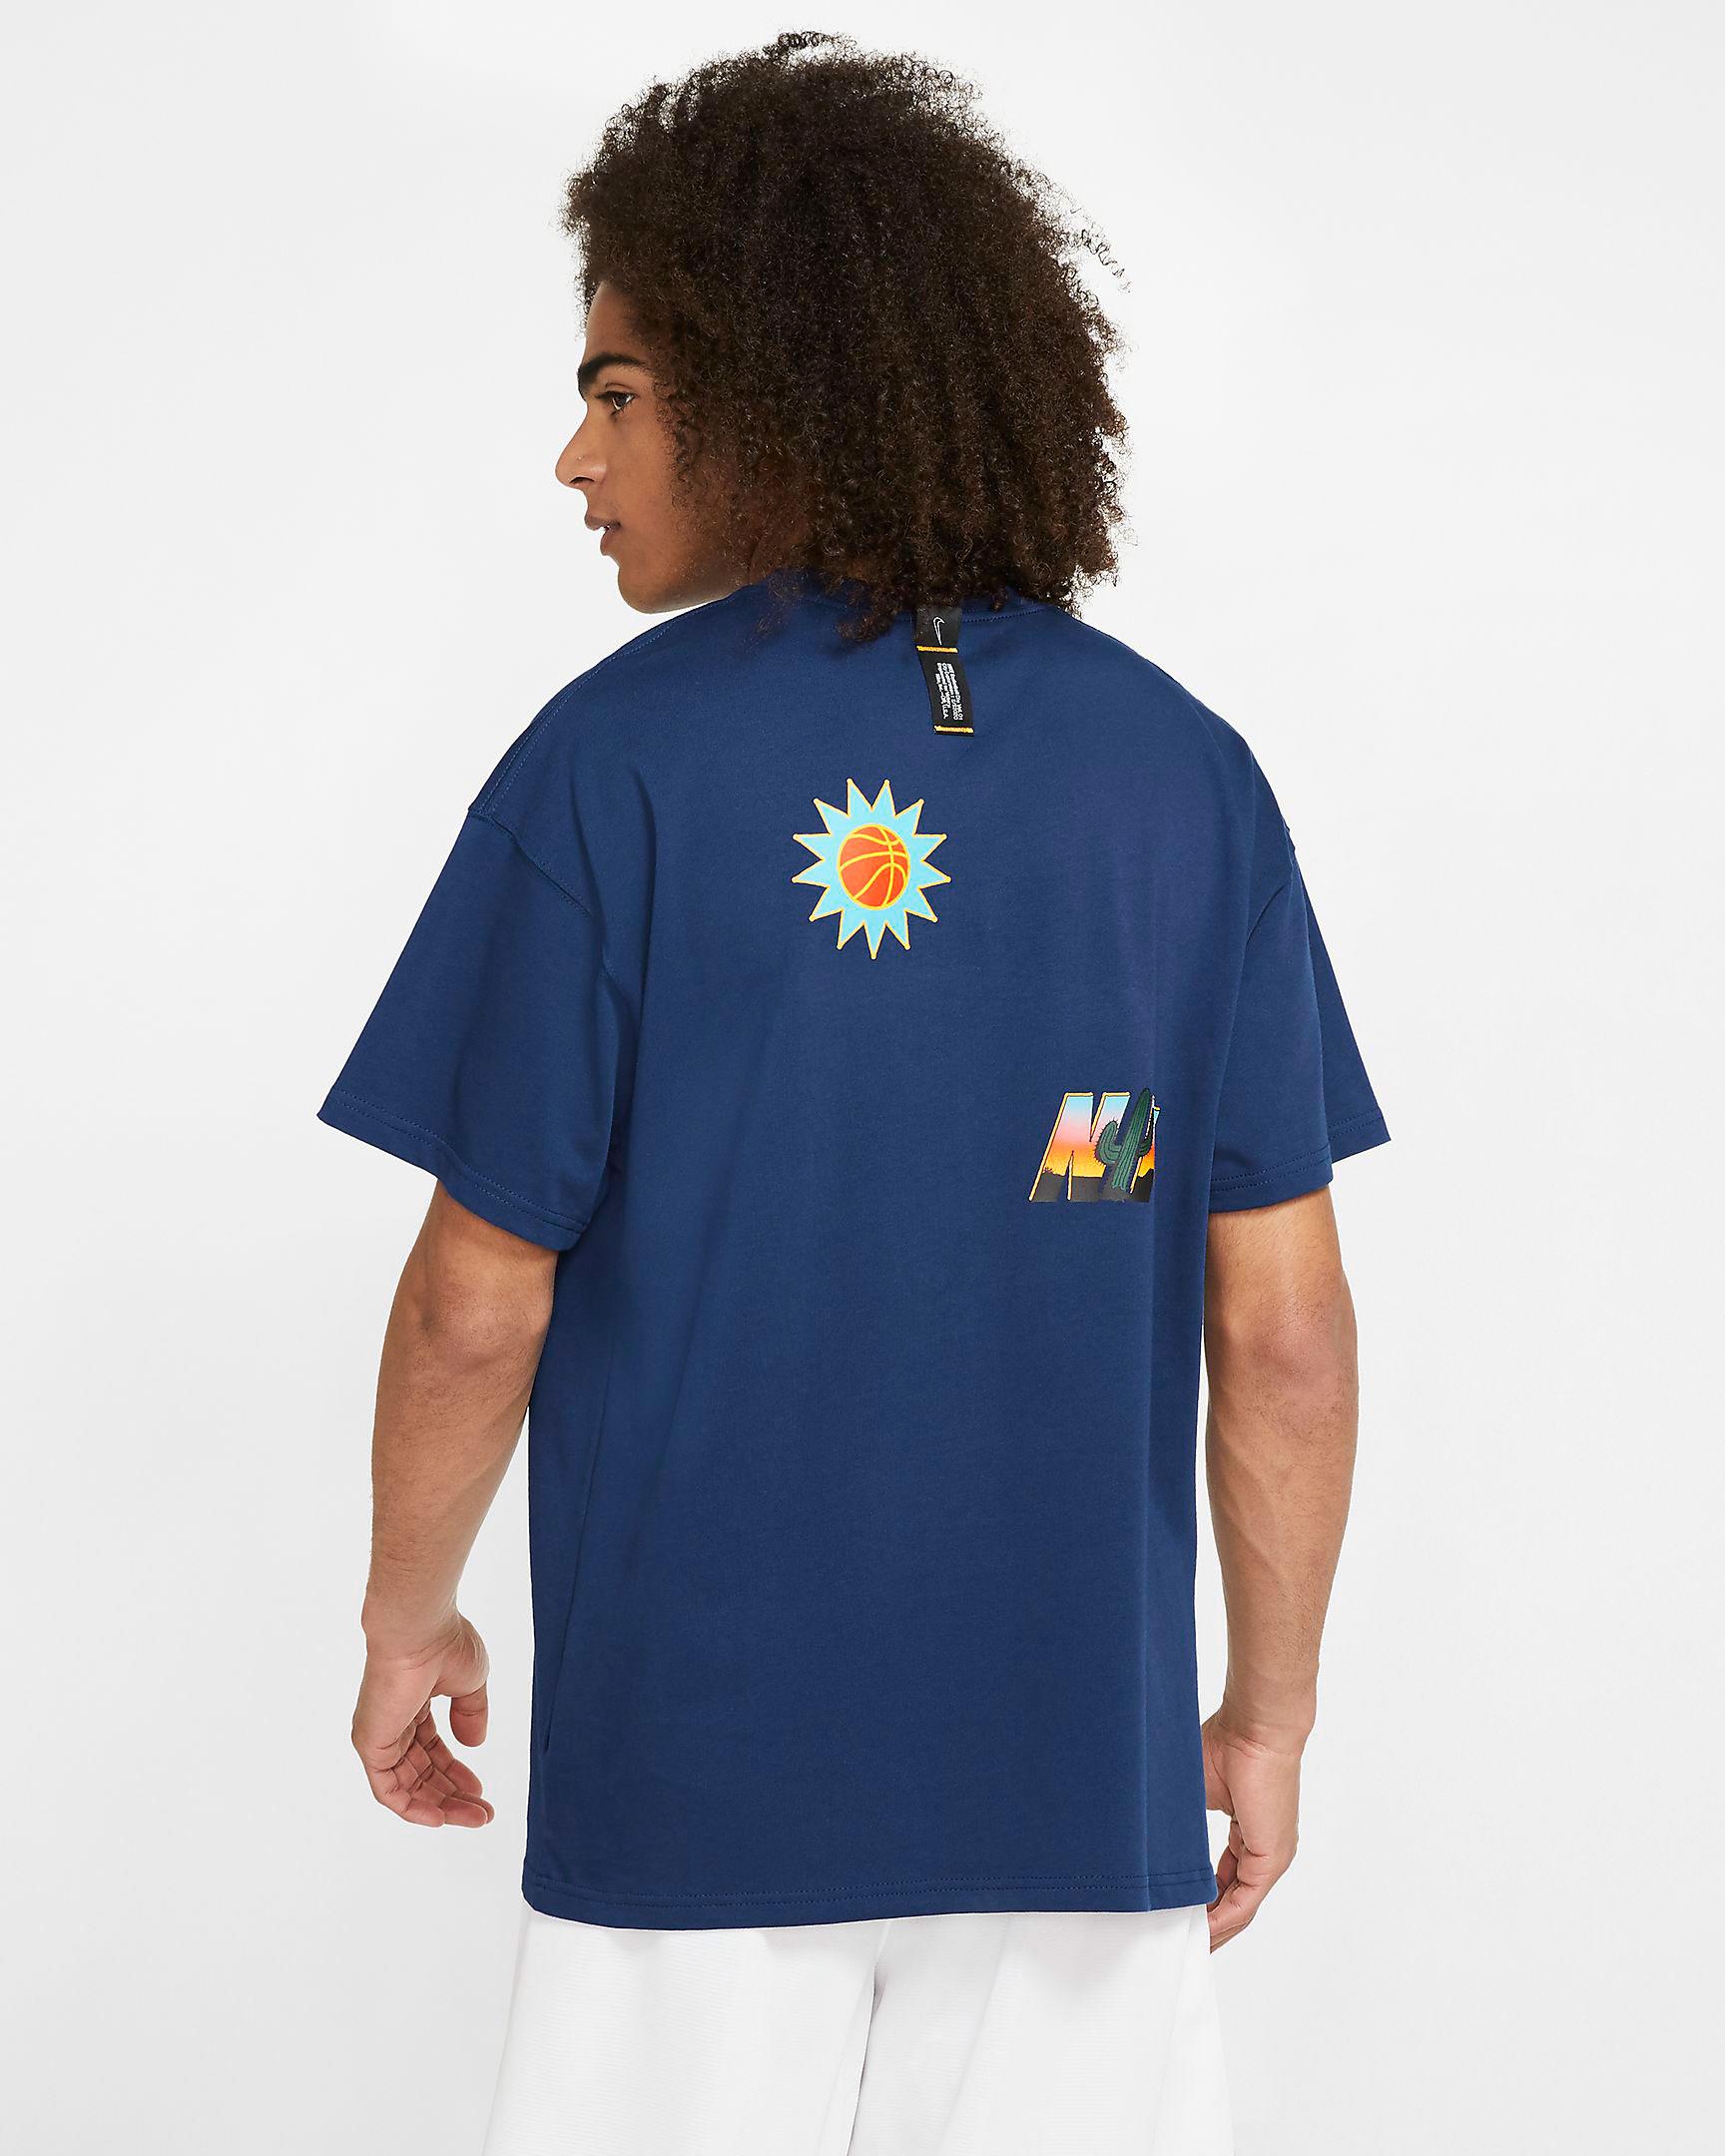 nike-foamposite-rugged-orange-shirt-match-2